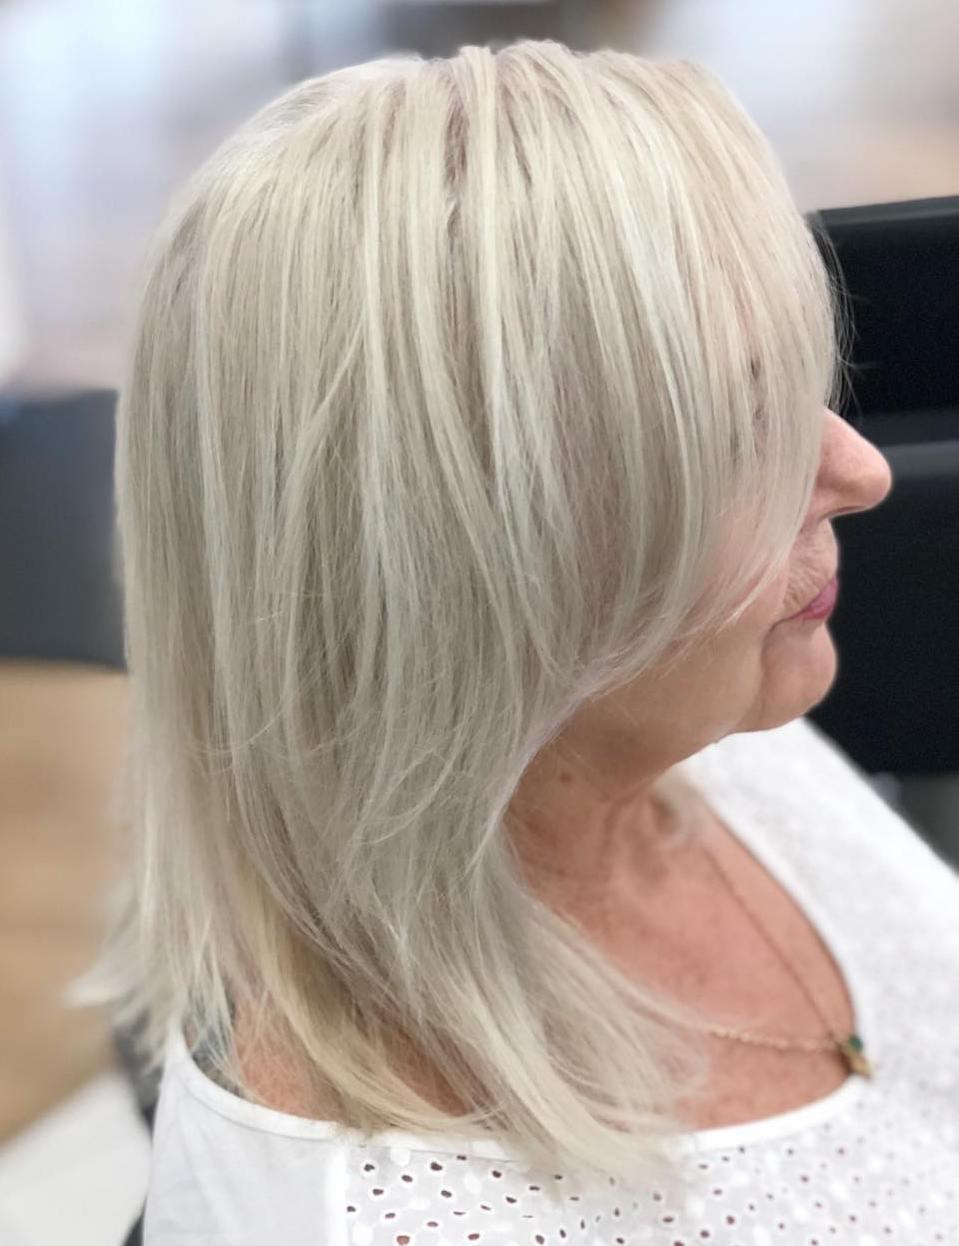 Shoulder-Length Layered Platinum Hairstyle